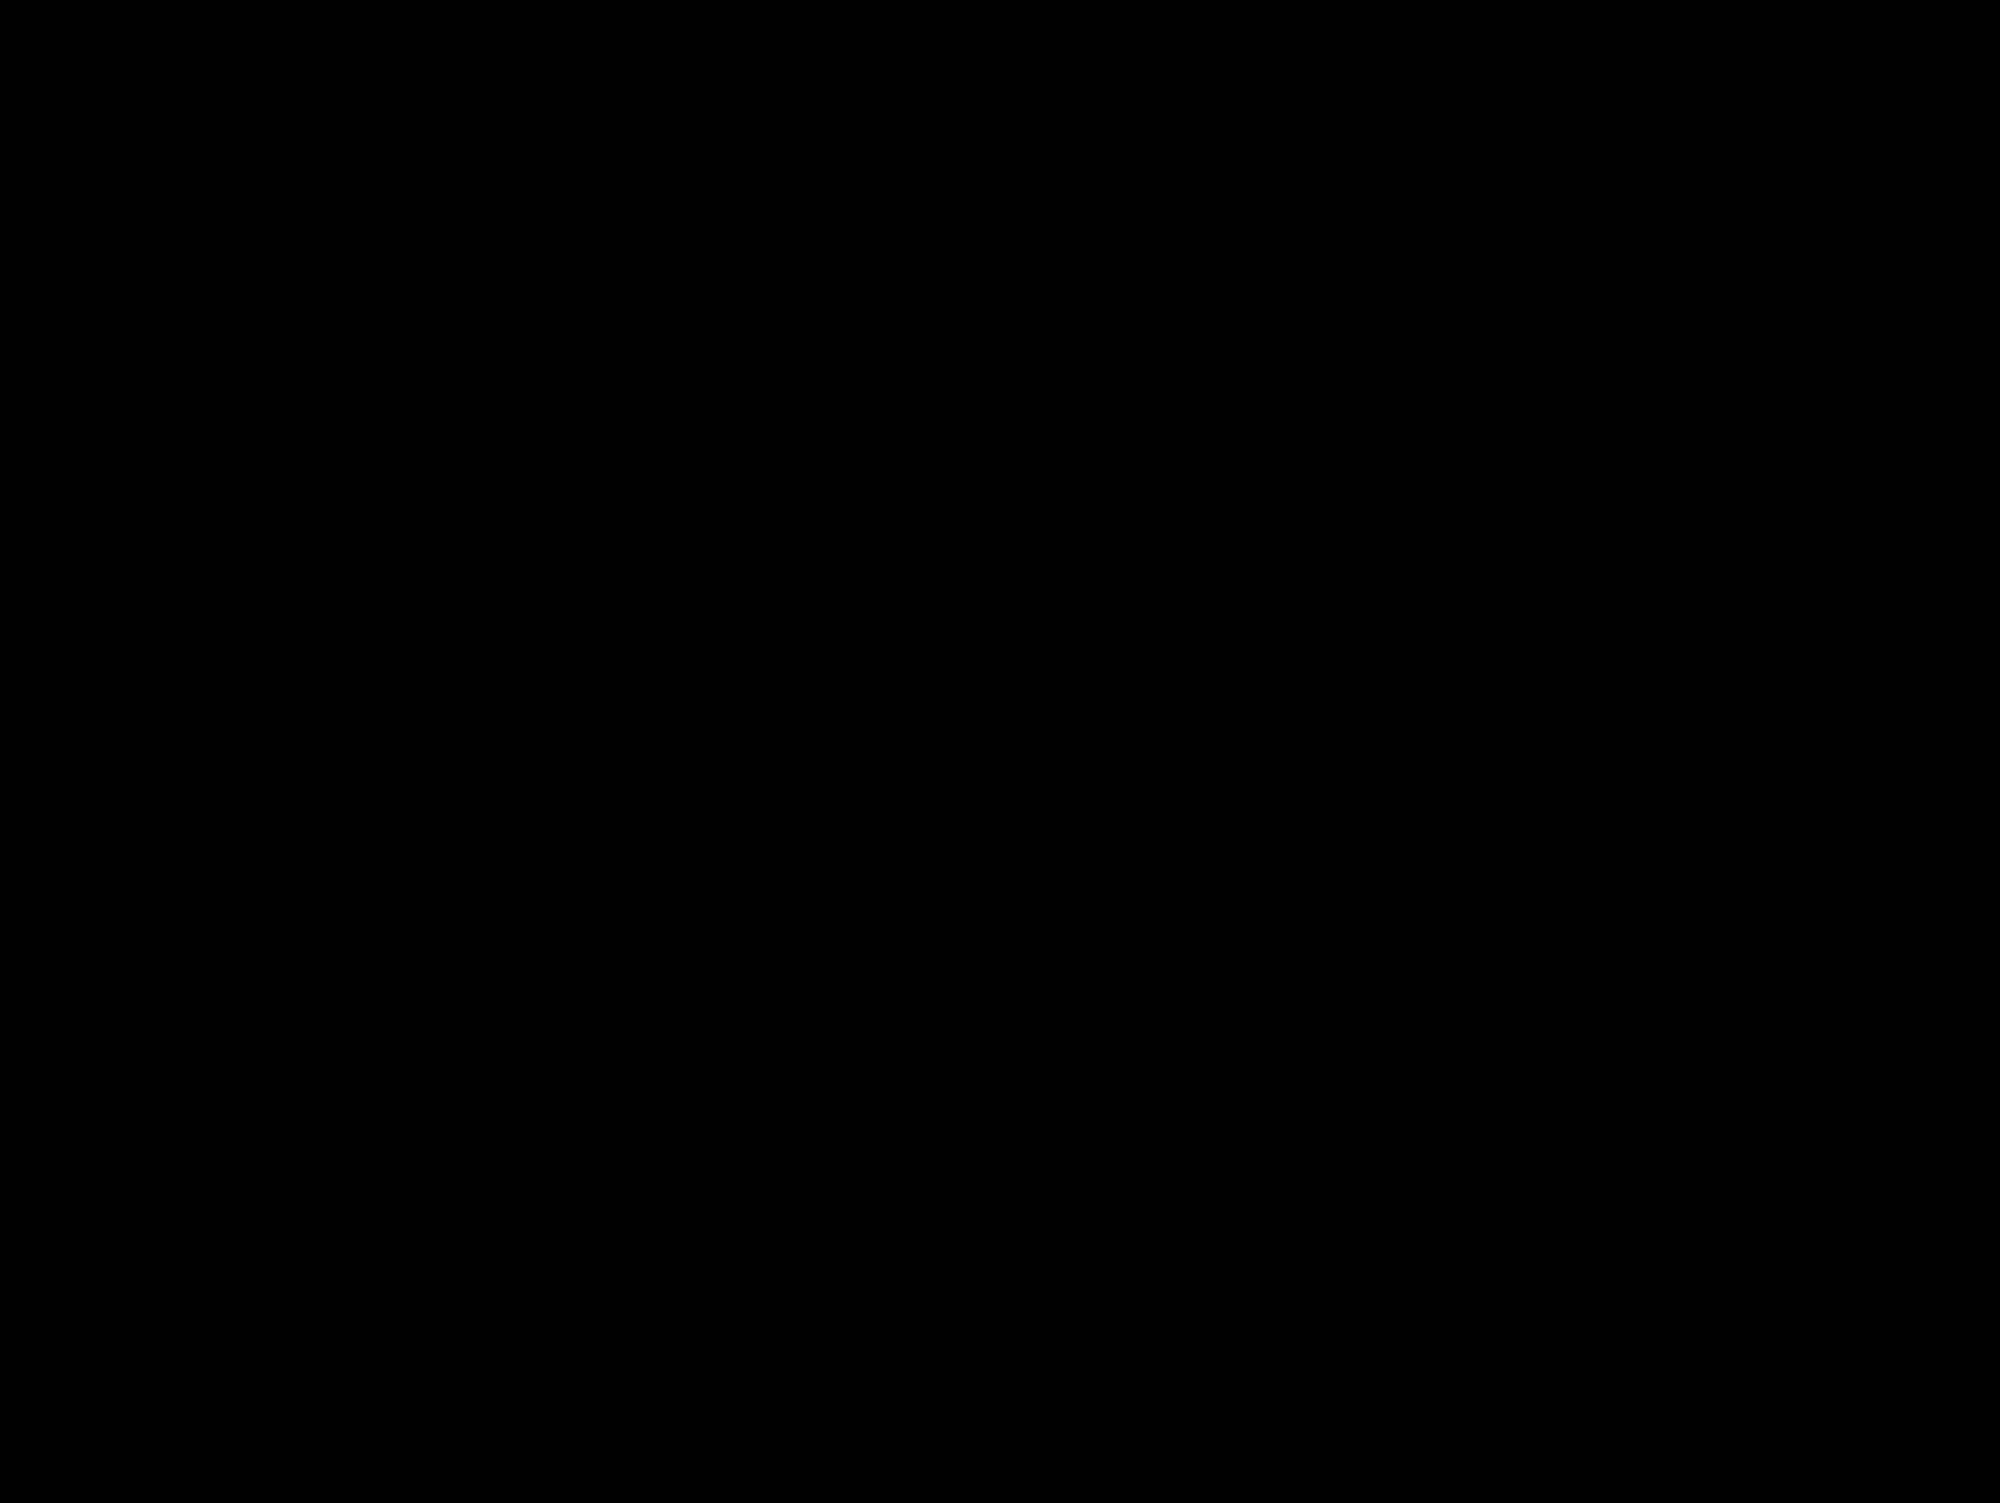 Логотип заведения La Forno